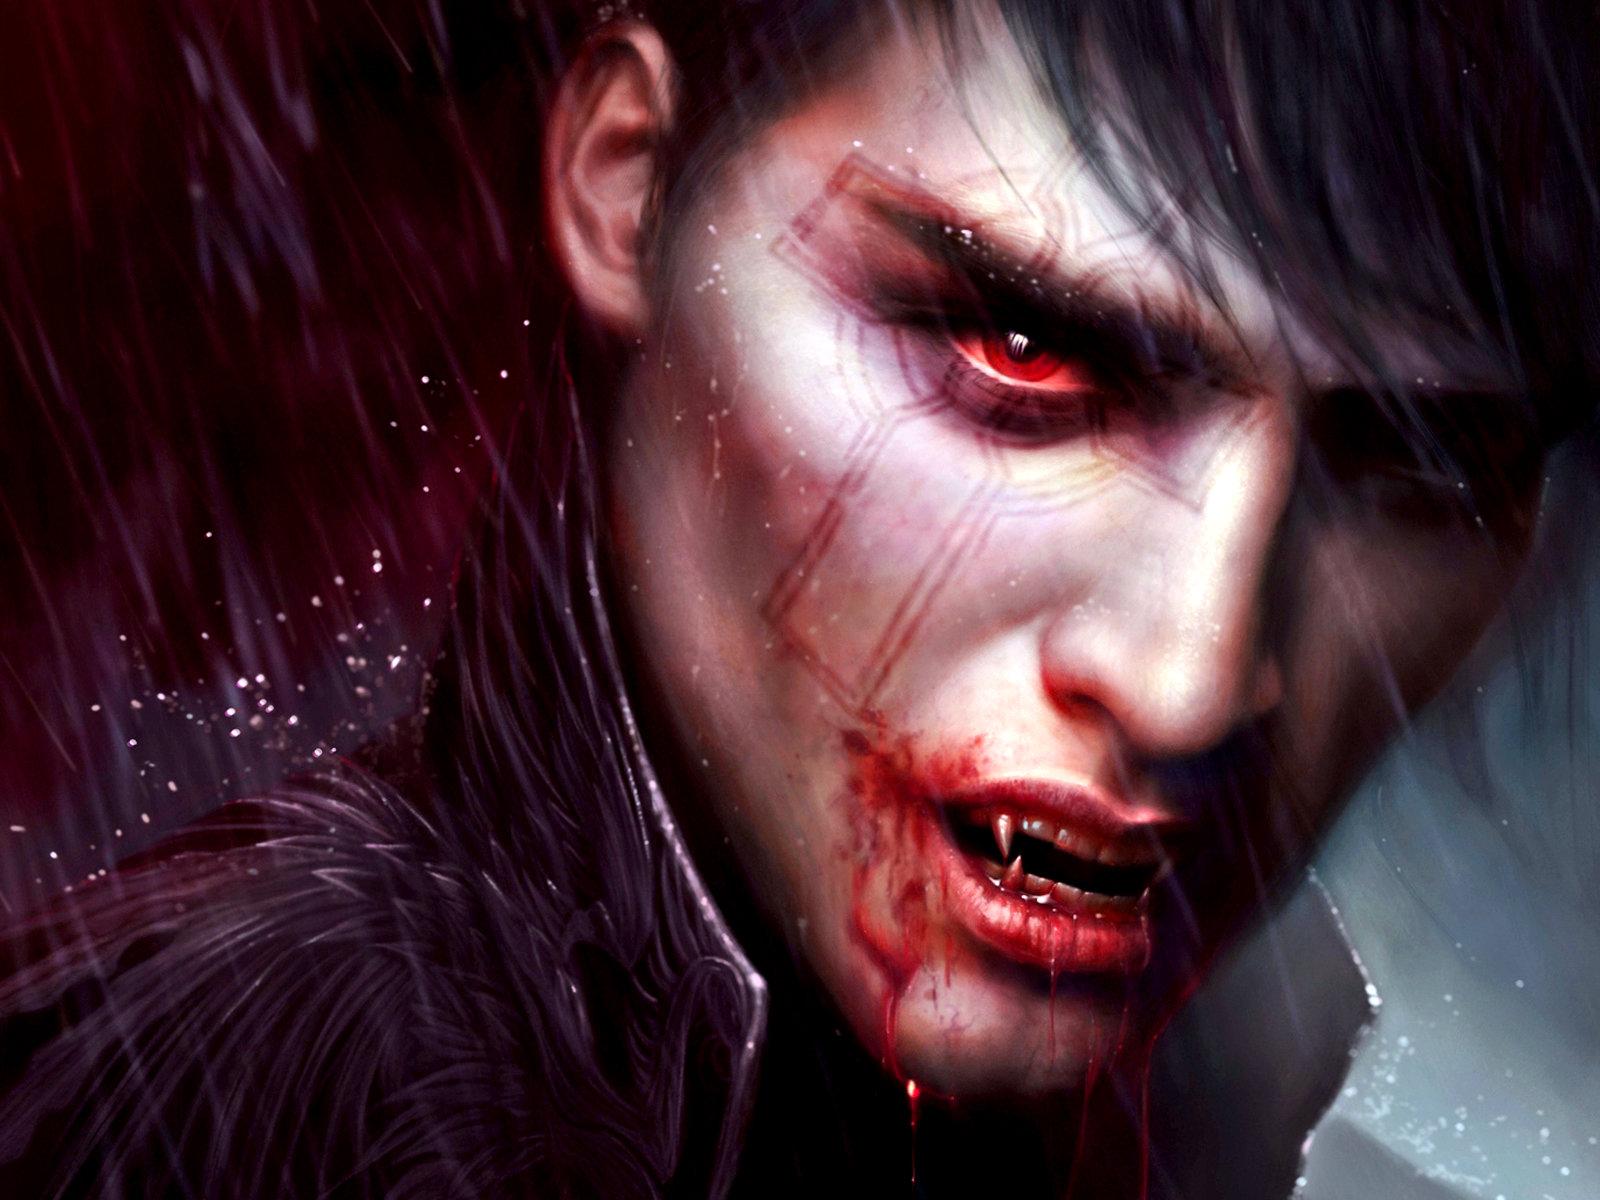 Cathula ii vampires de sexe